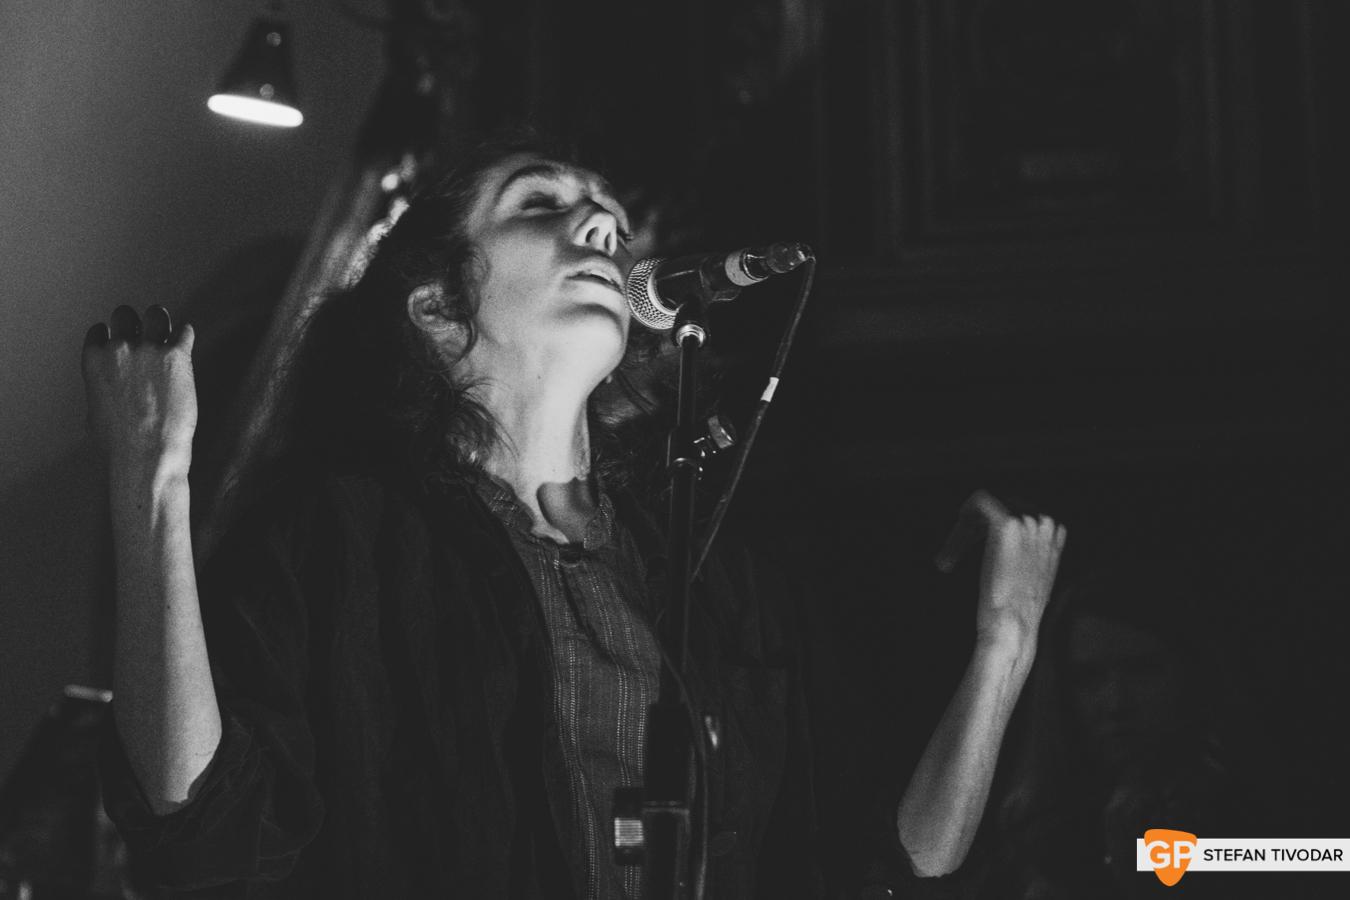 Anna Mieke Seen & Heard St Patrick's Festival Tivodar 10